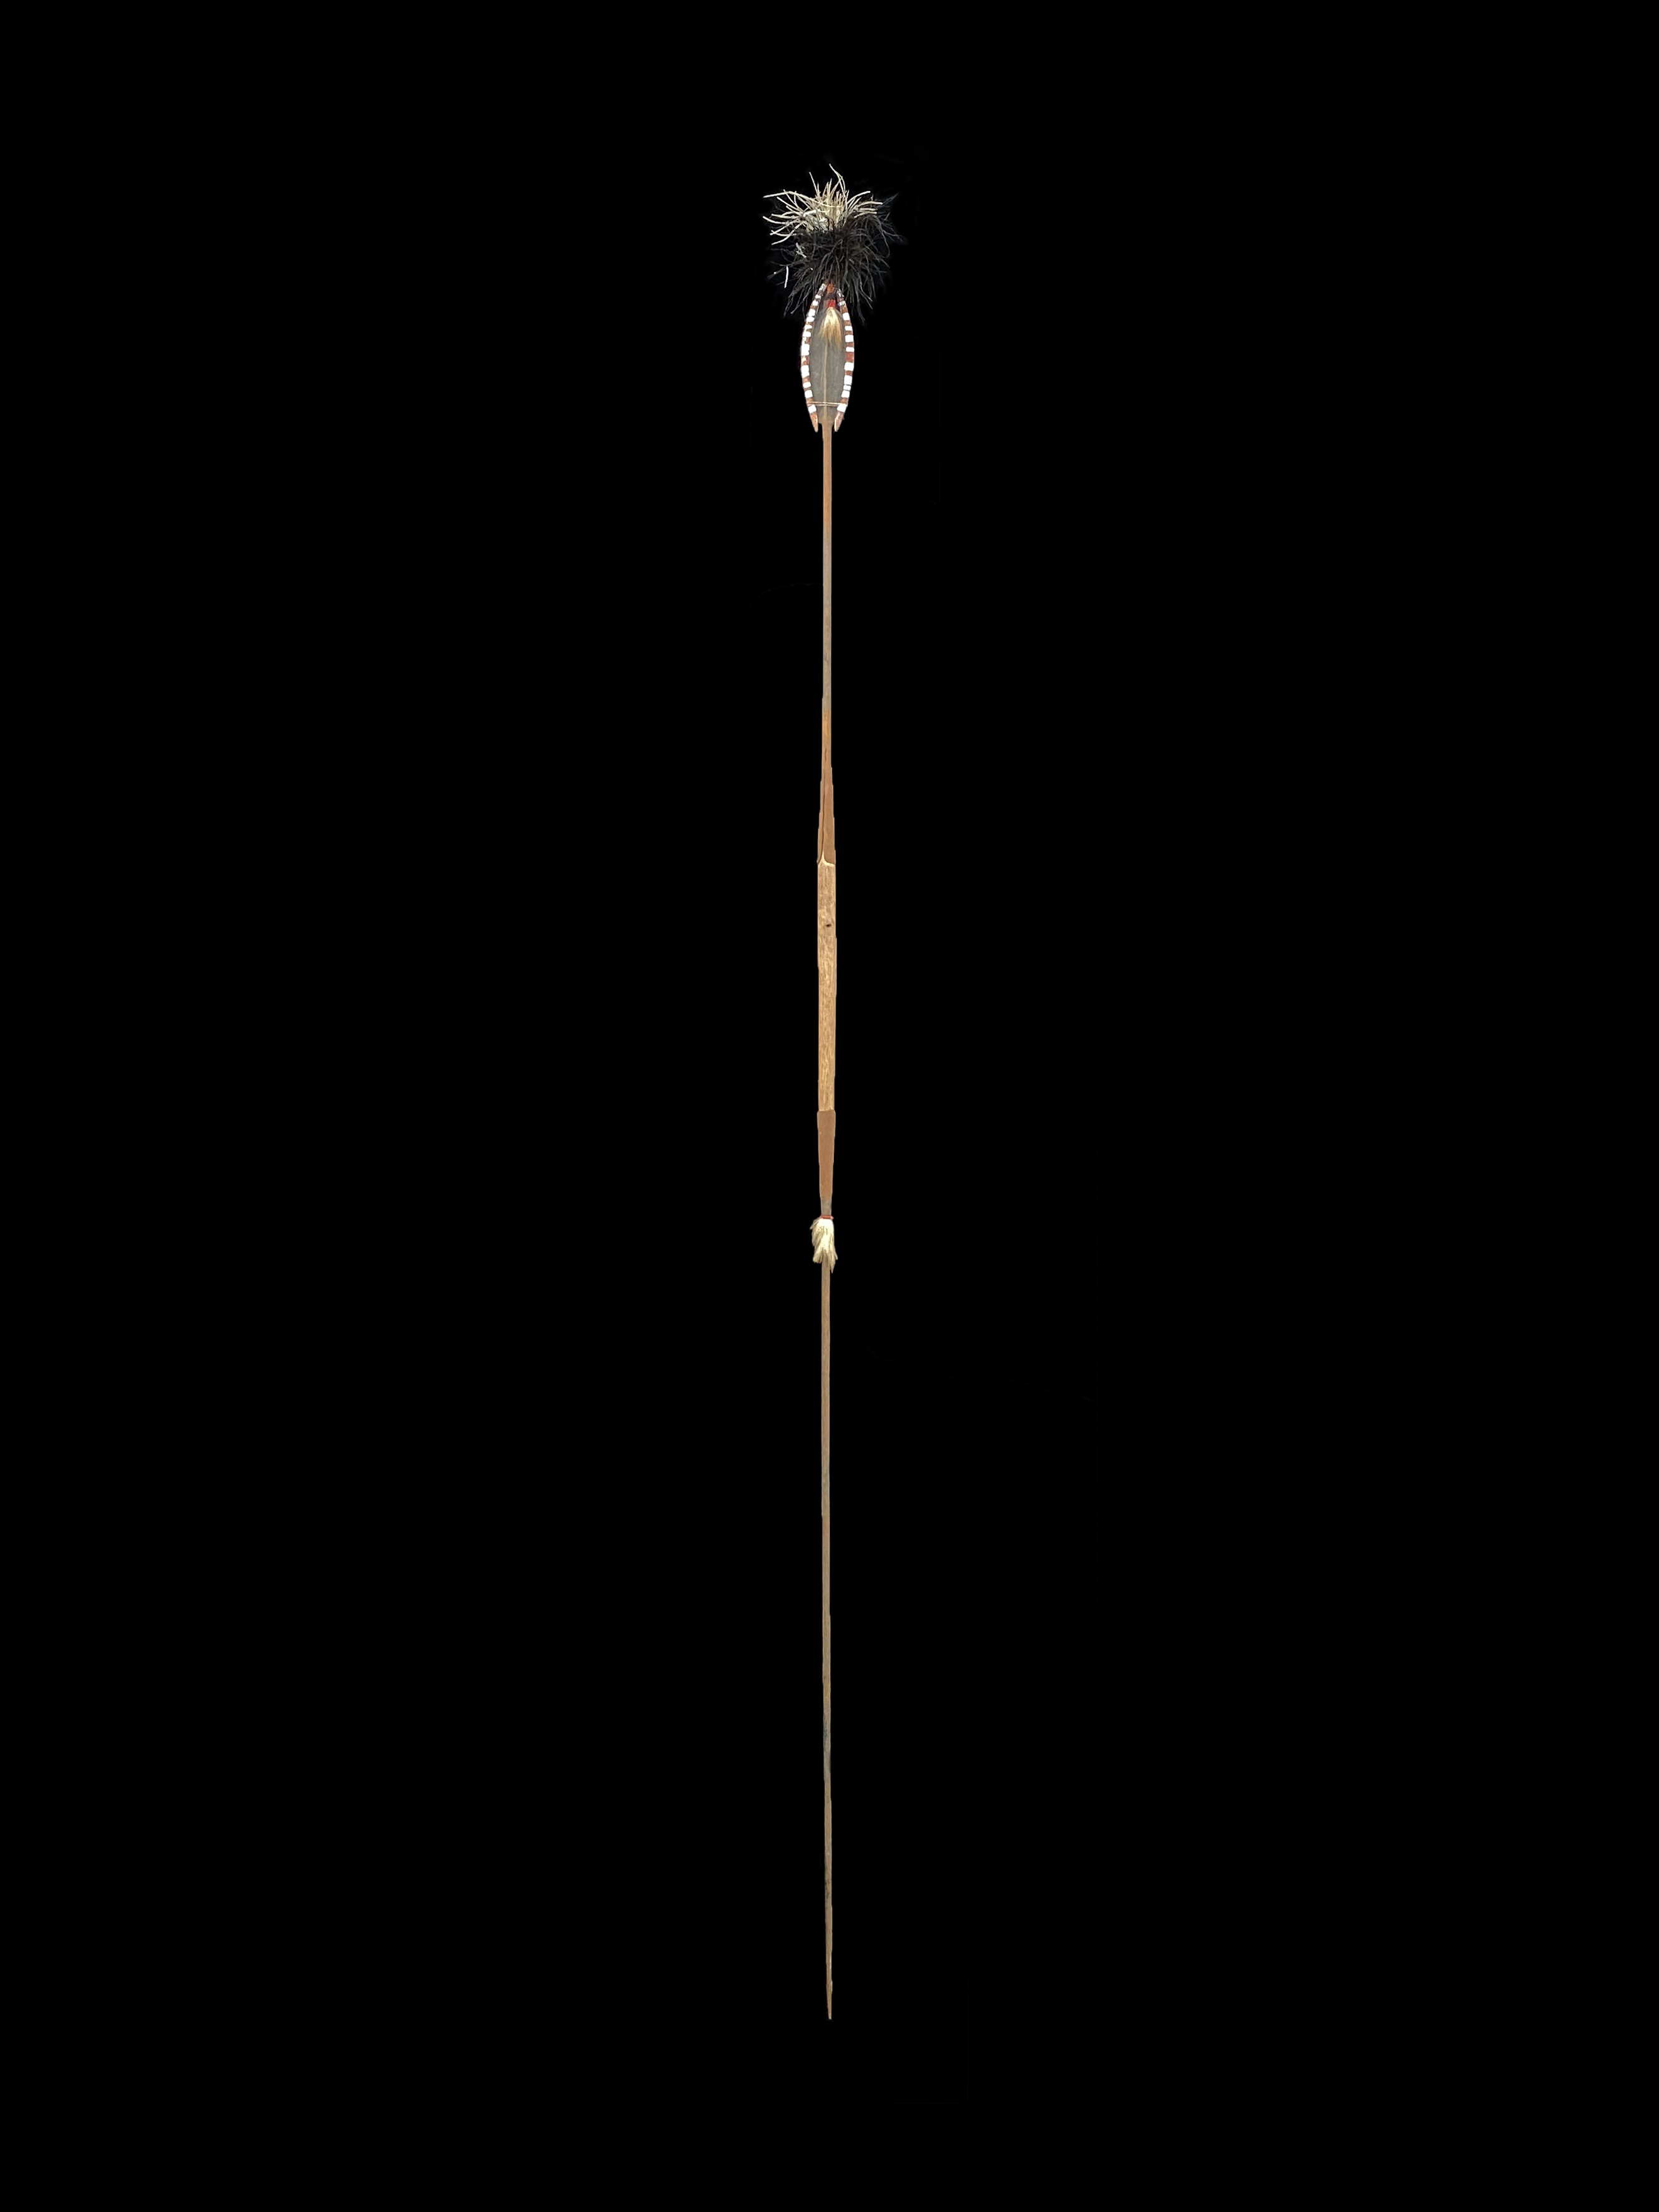 Spear of Peace - Samburu People, northern Kenya